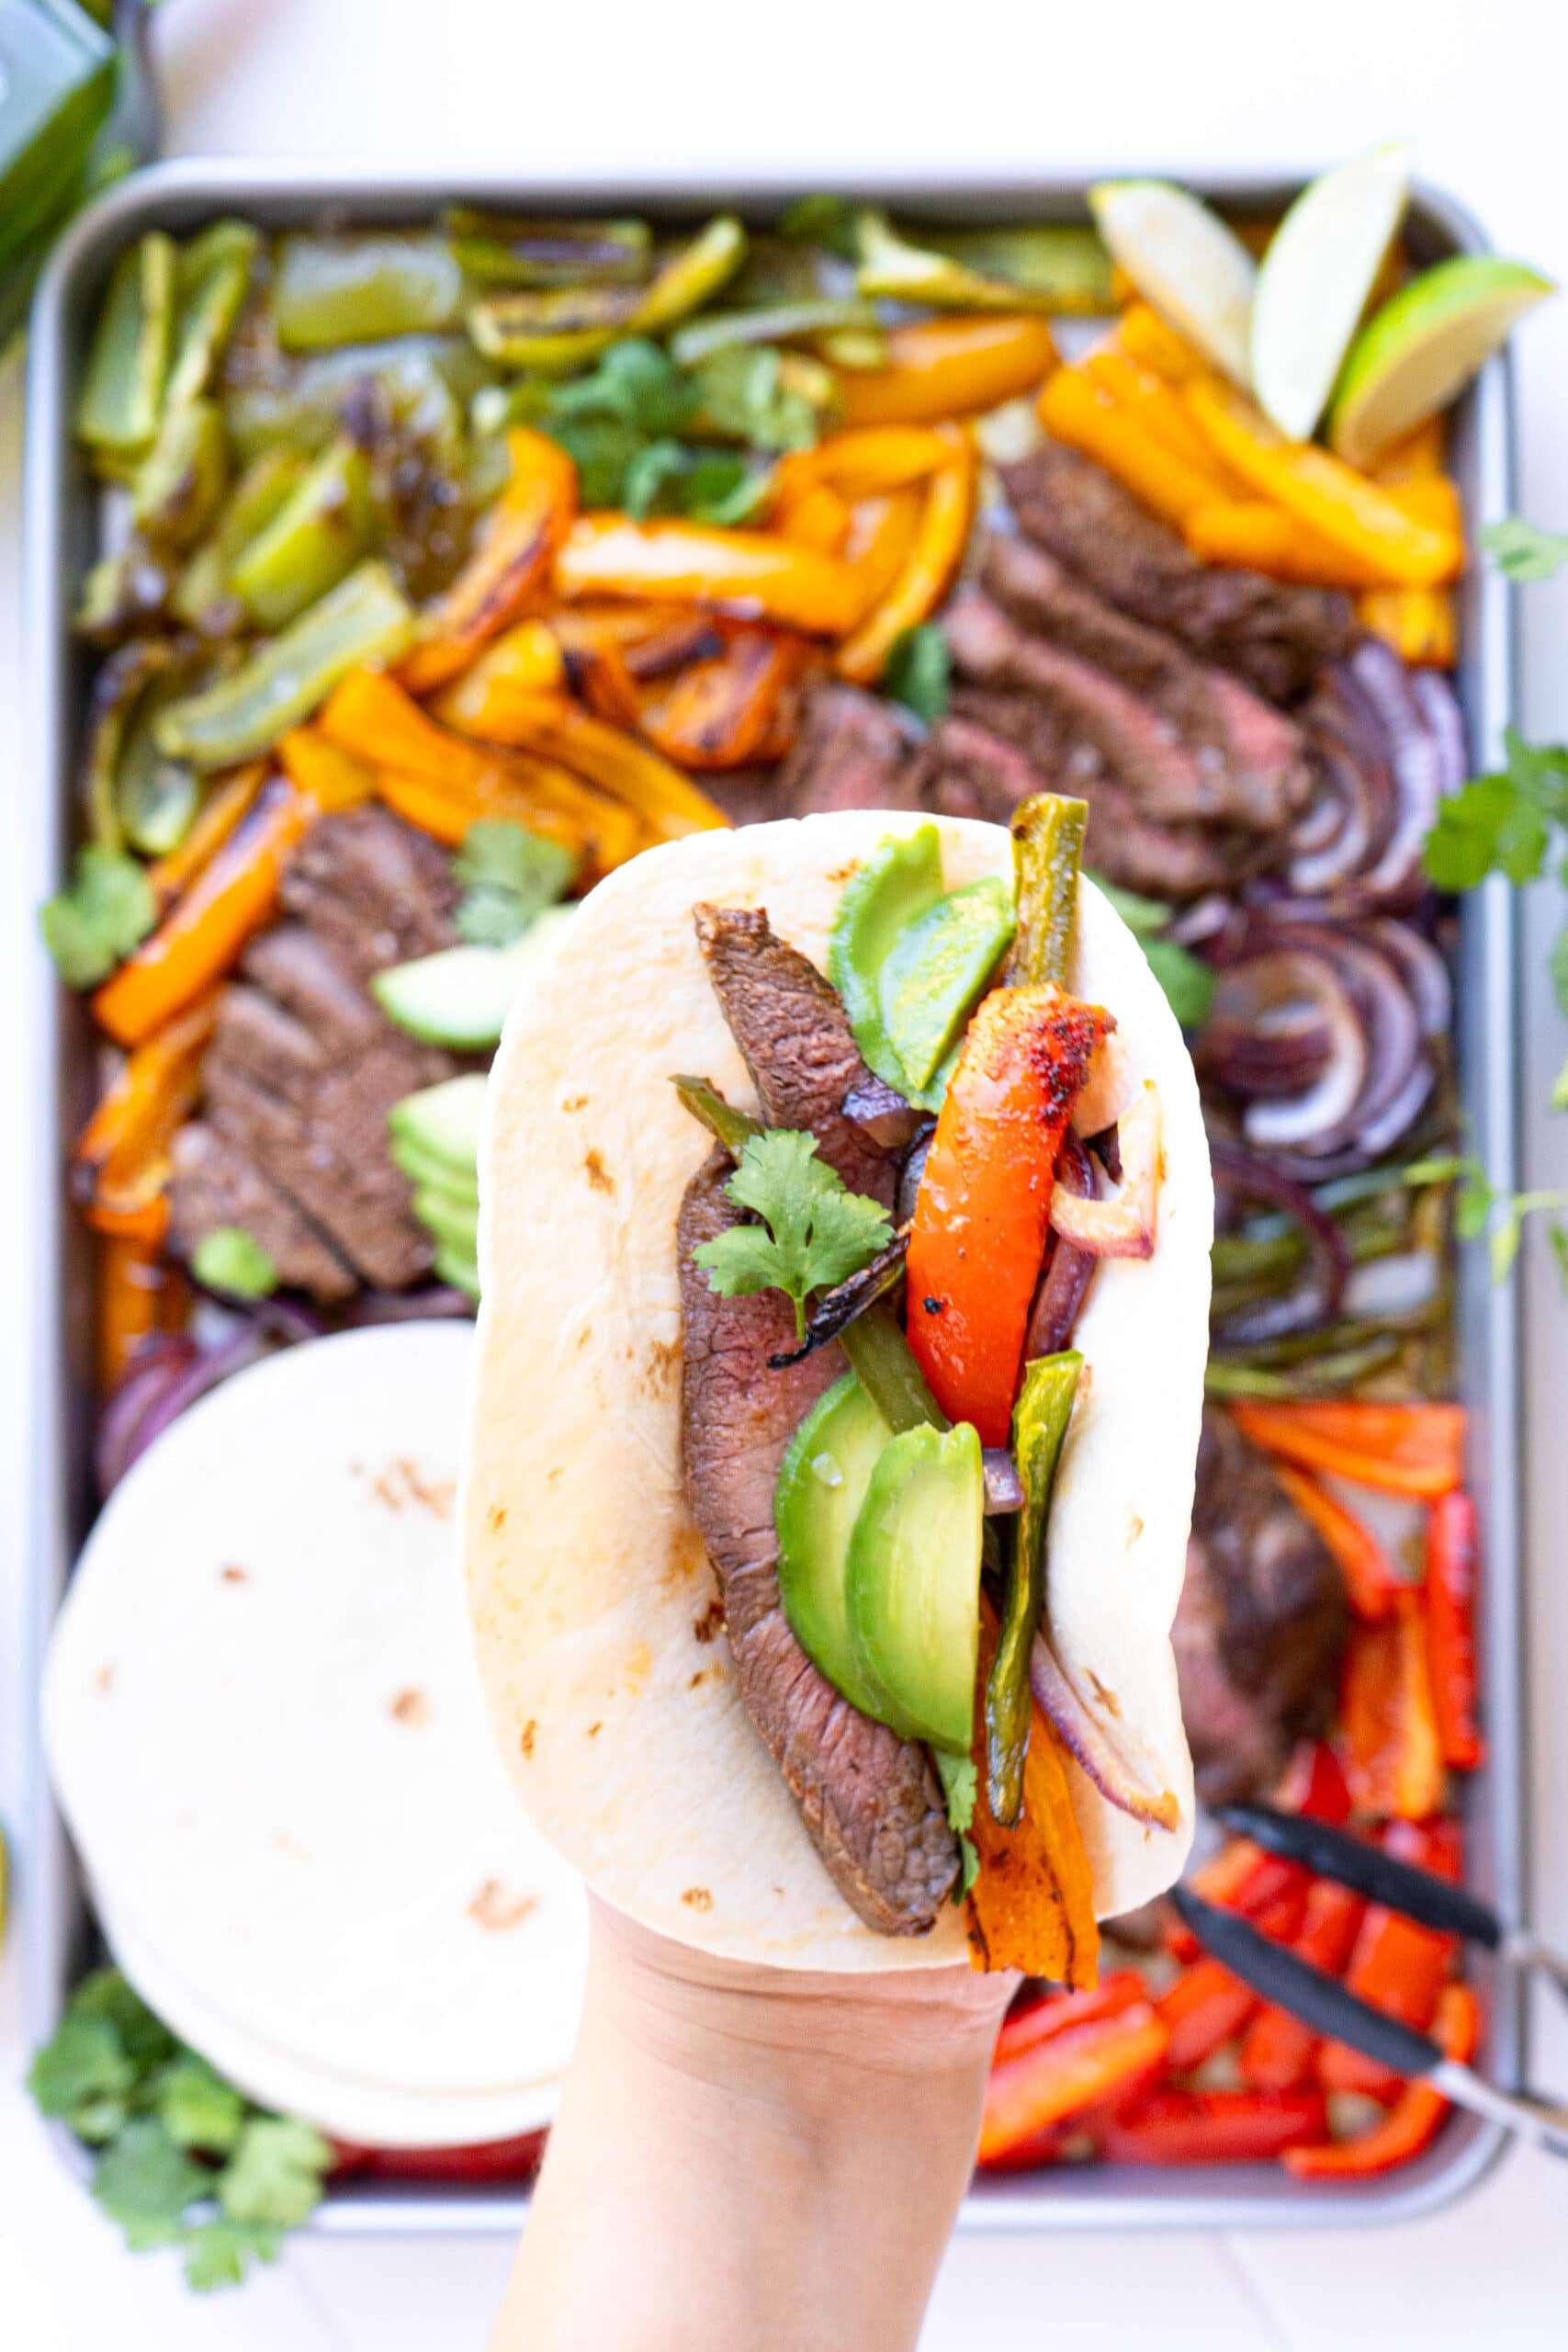 A hand holding a steak fajita over a sheet pan full of fajita ingredients.